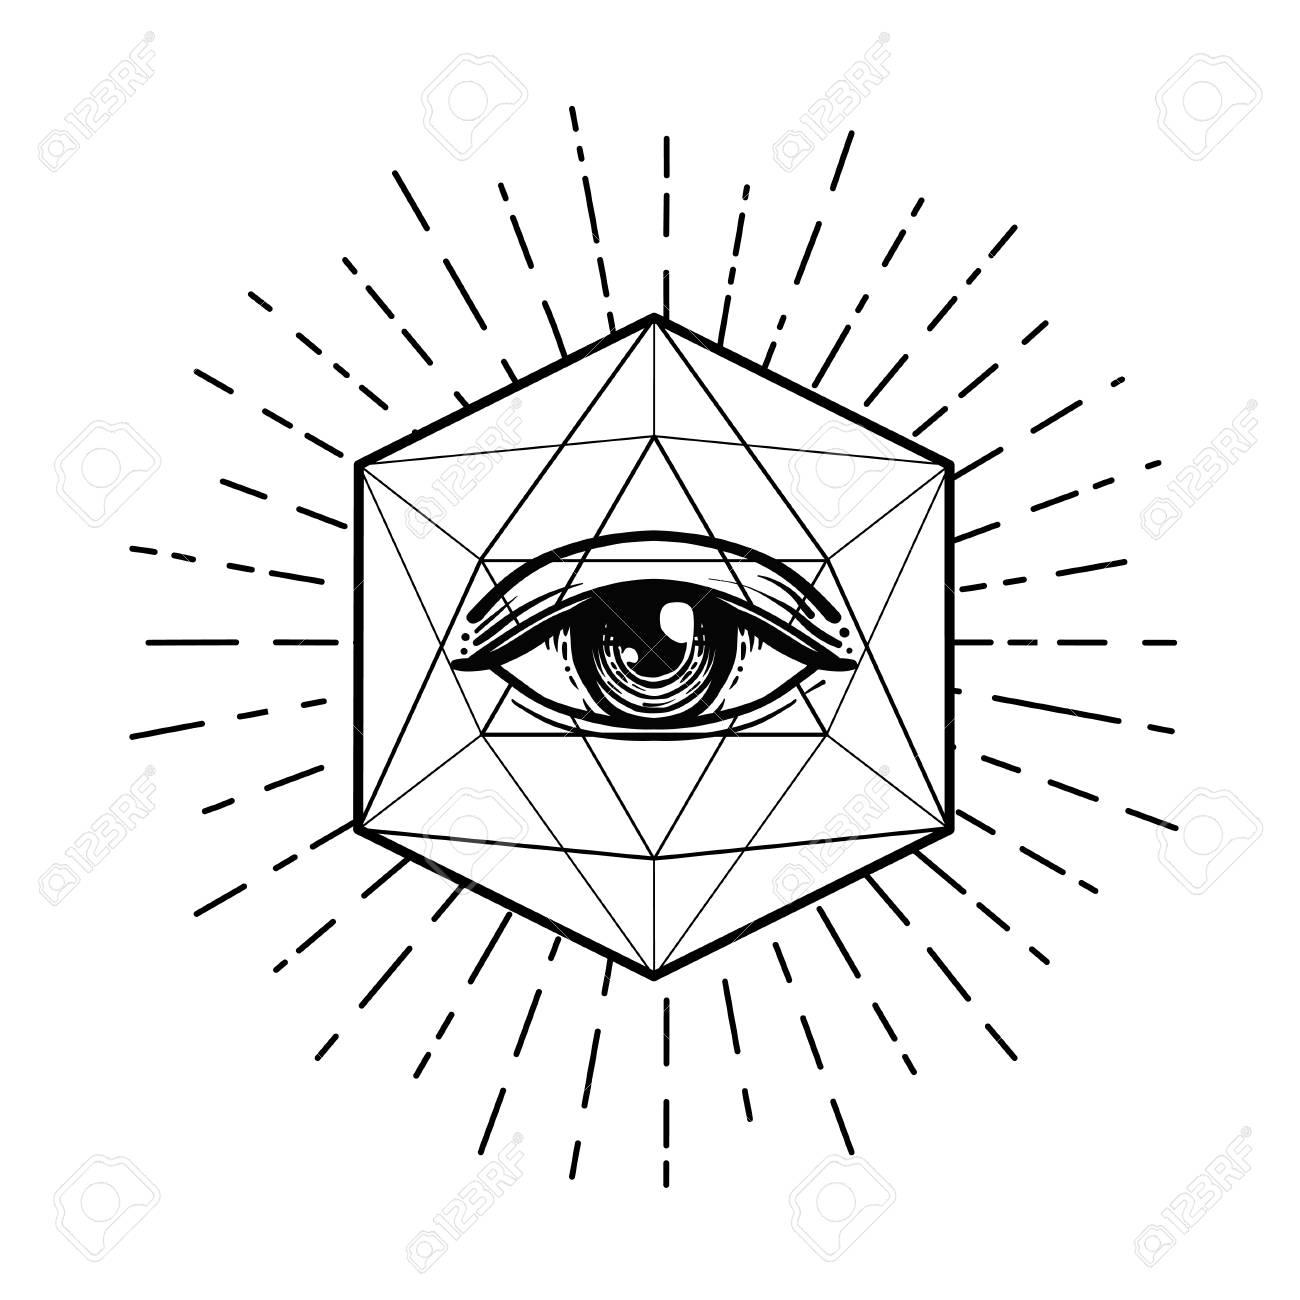 Black Work Tattoo Flash Eye Of Providence Masonic Symbol All Royalty Free Cliparts Vectors And Stock Illustration Image 99729368